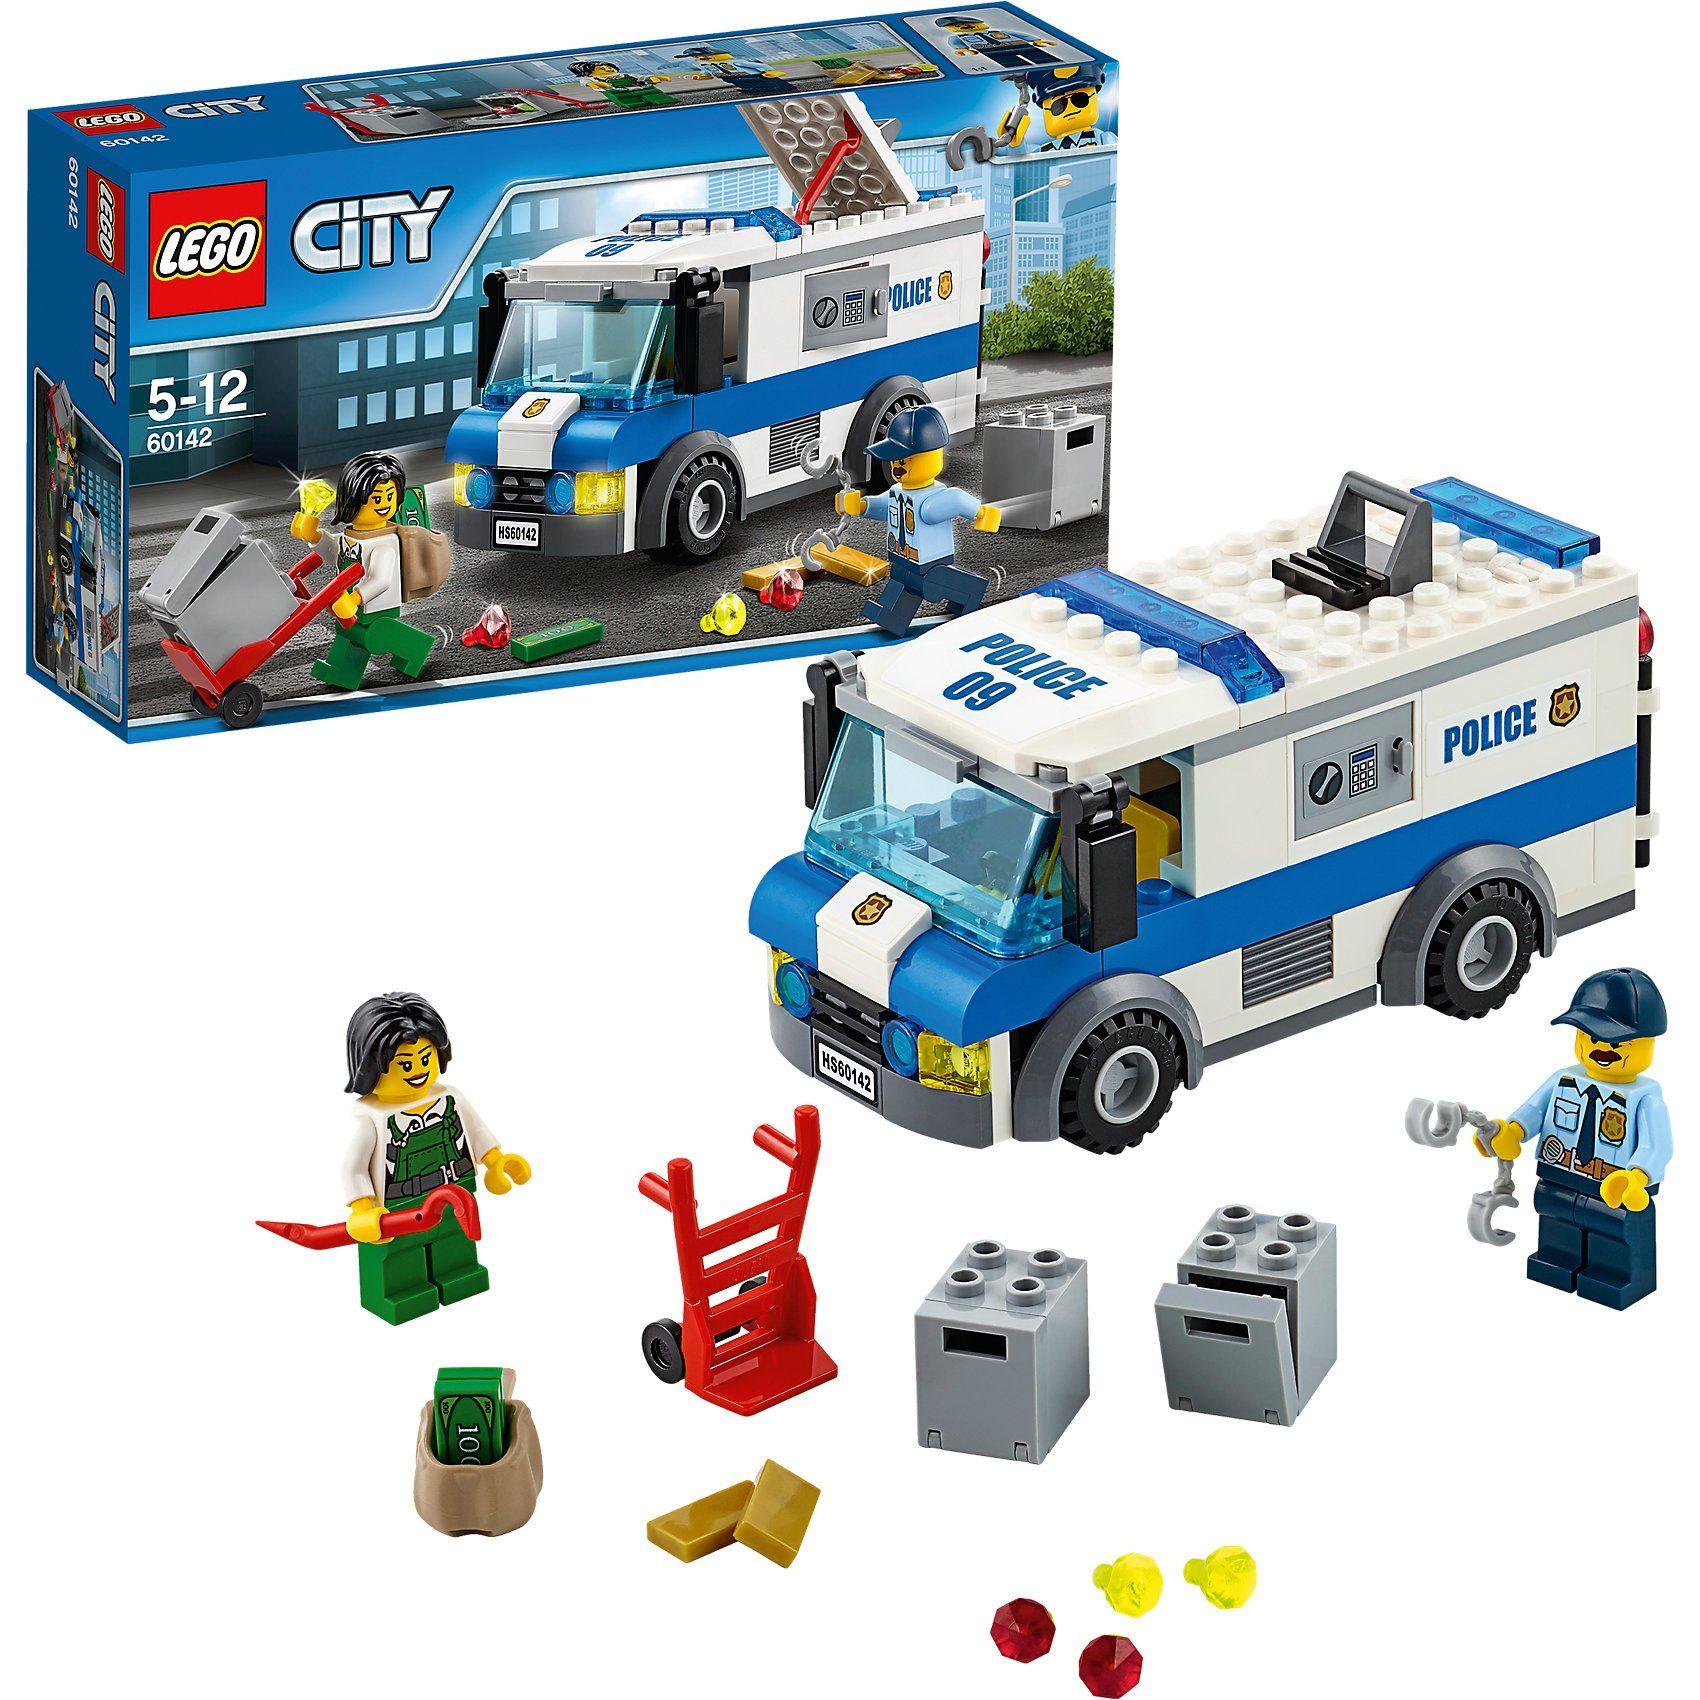 LEGO 60142 City: Geldtransporter